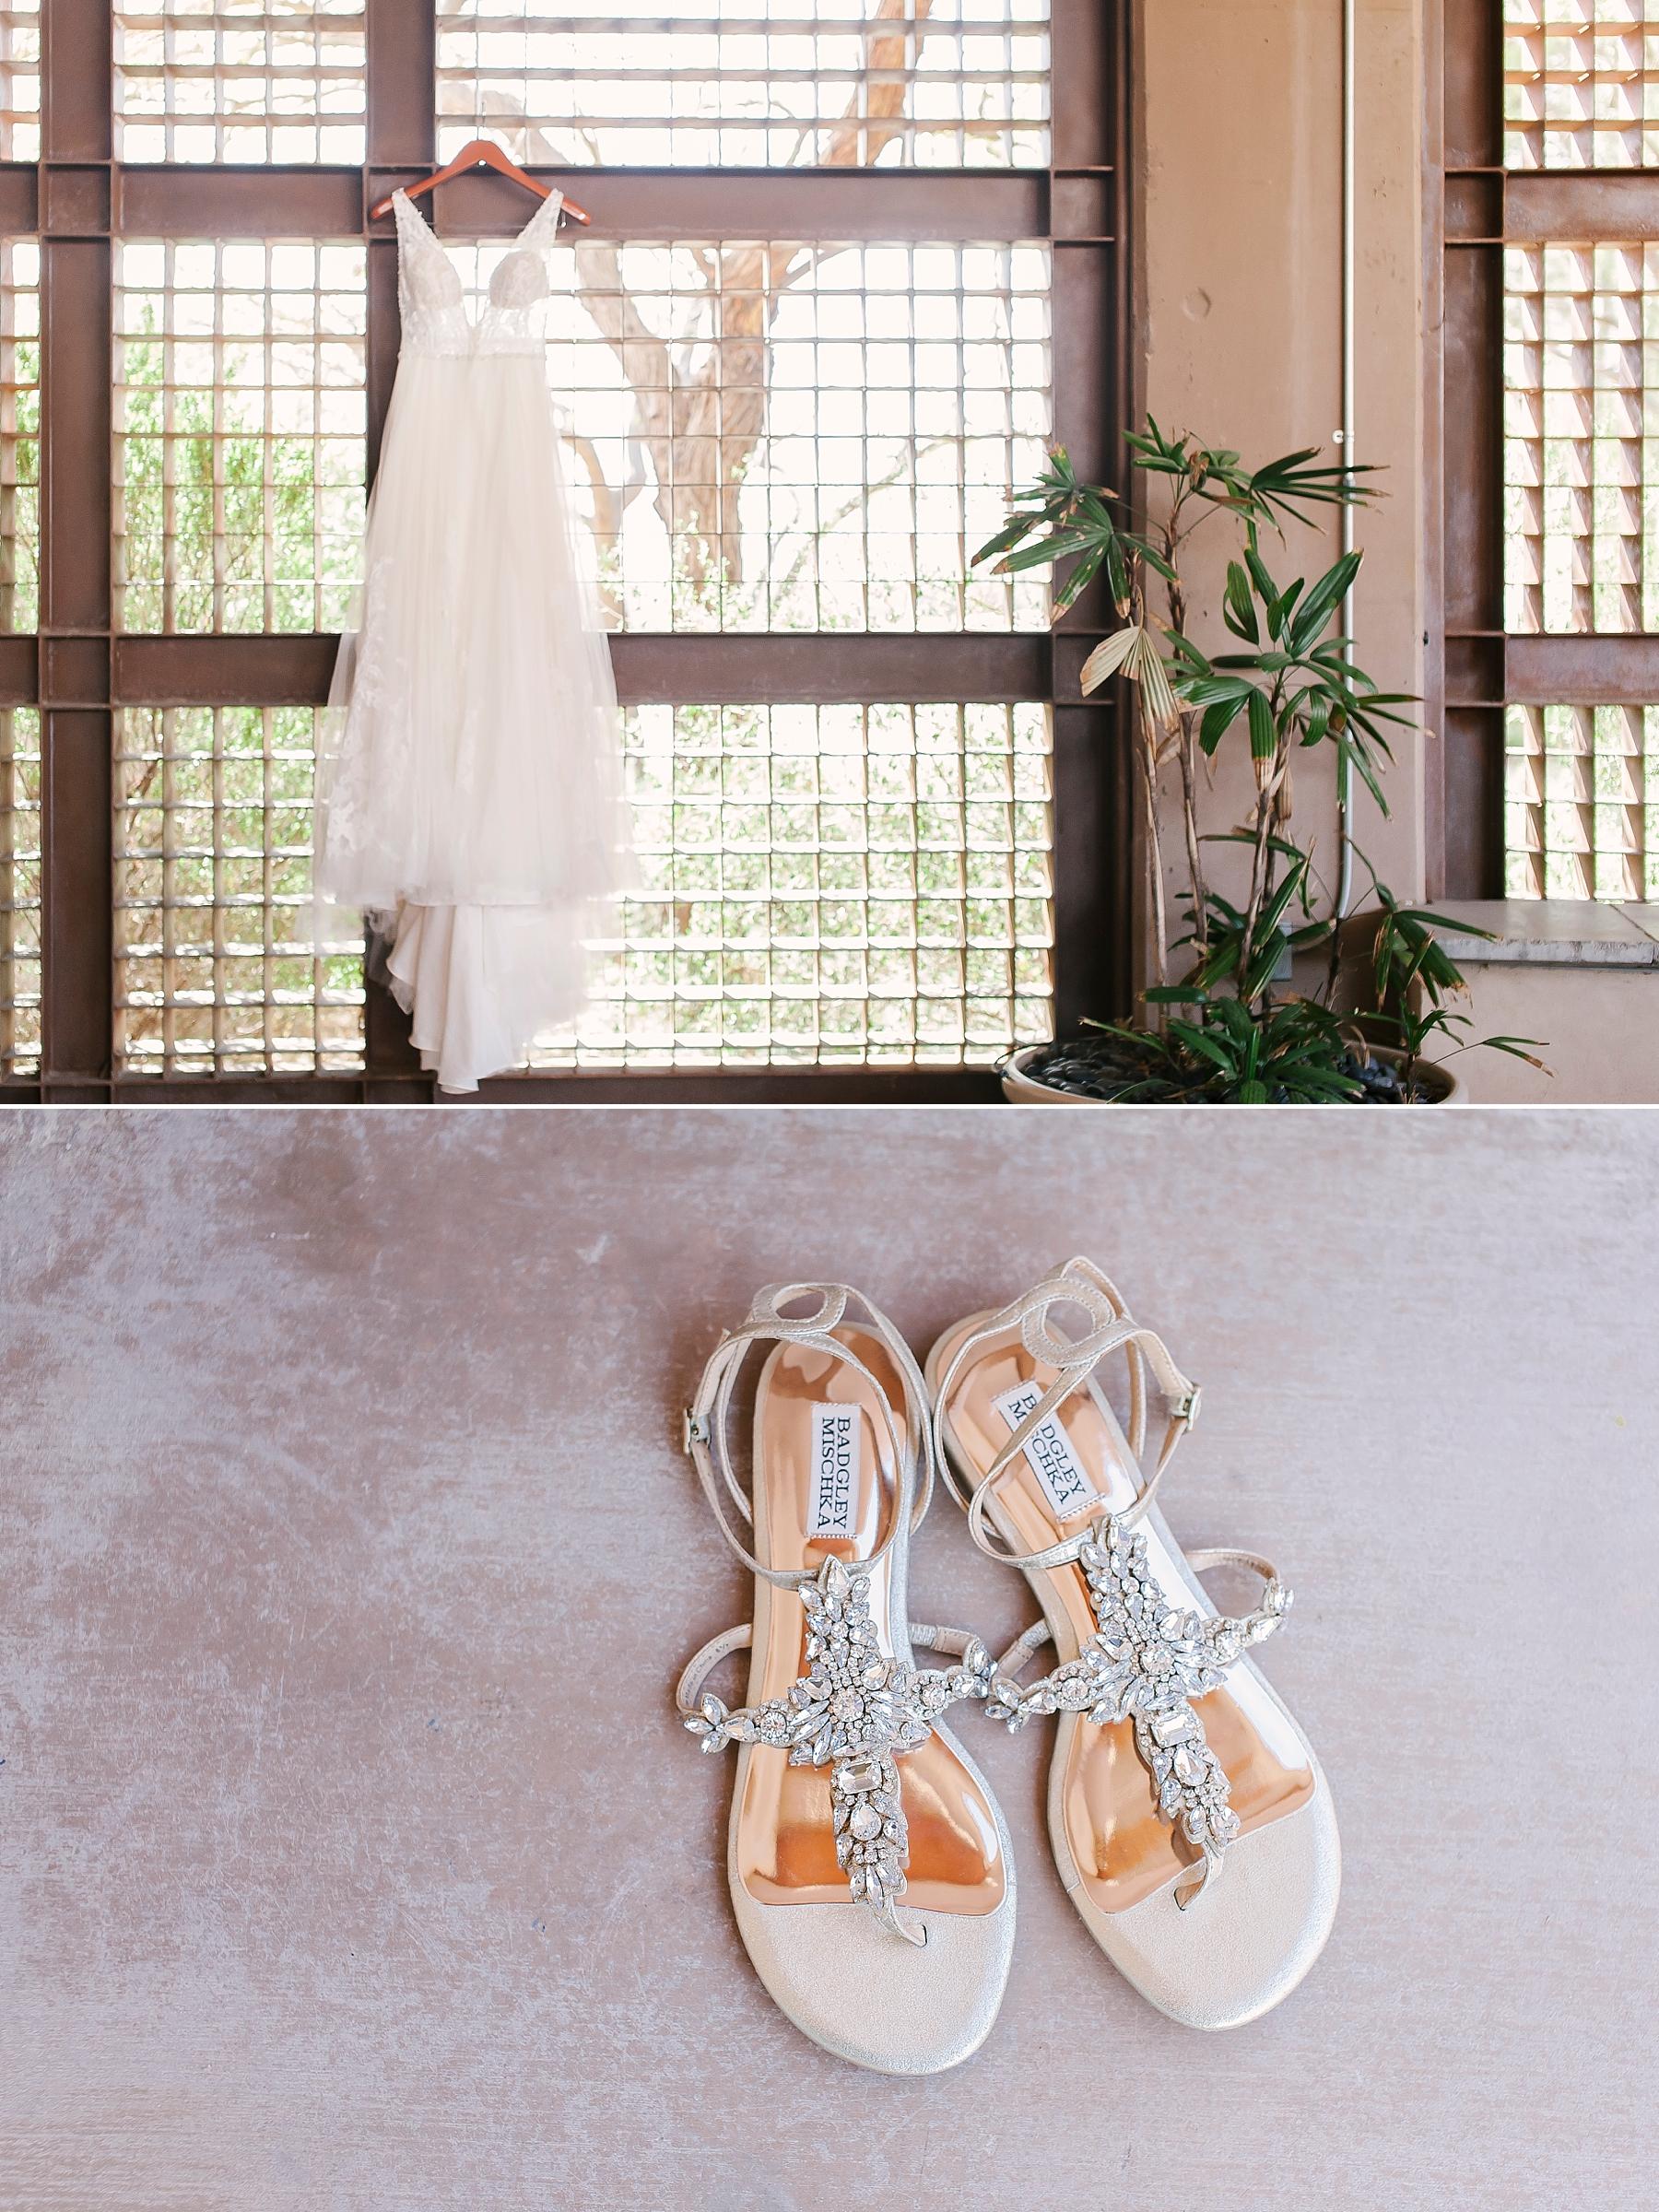 springs-preserve-wedding-las-vegas-destination-photography-the-emerics-01.jpg